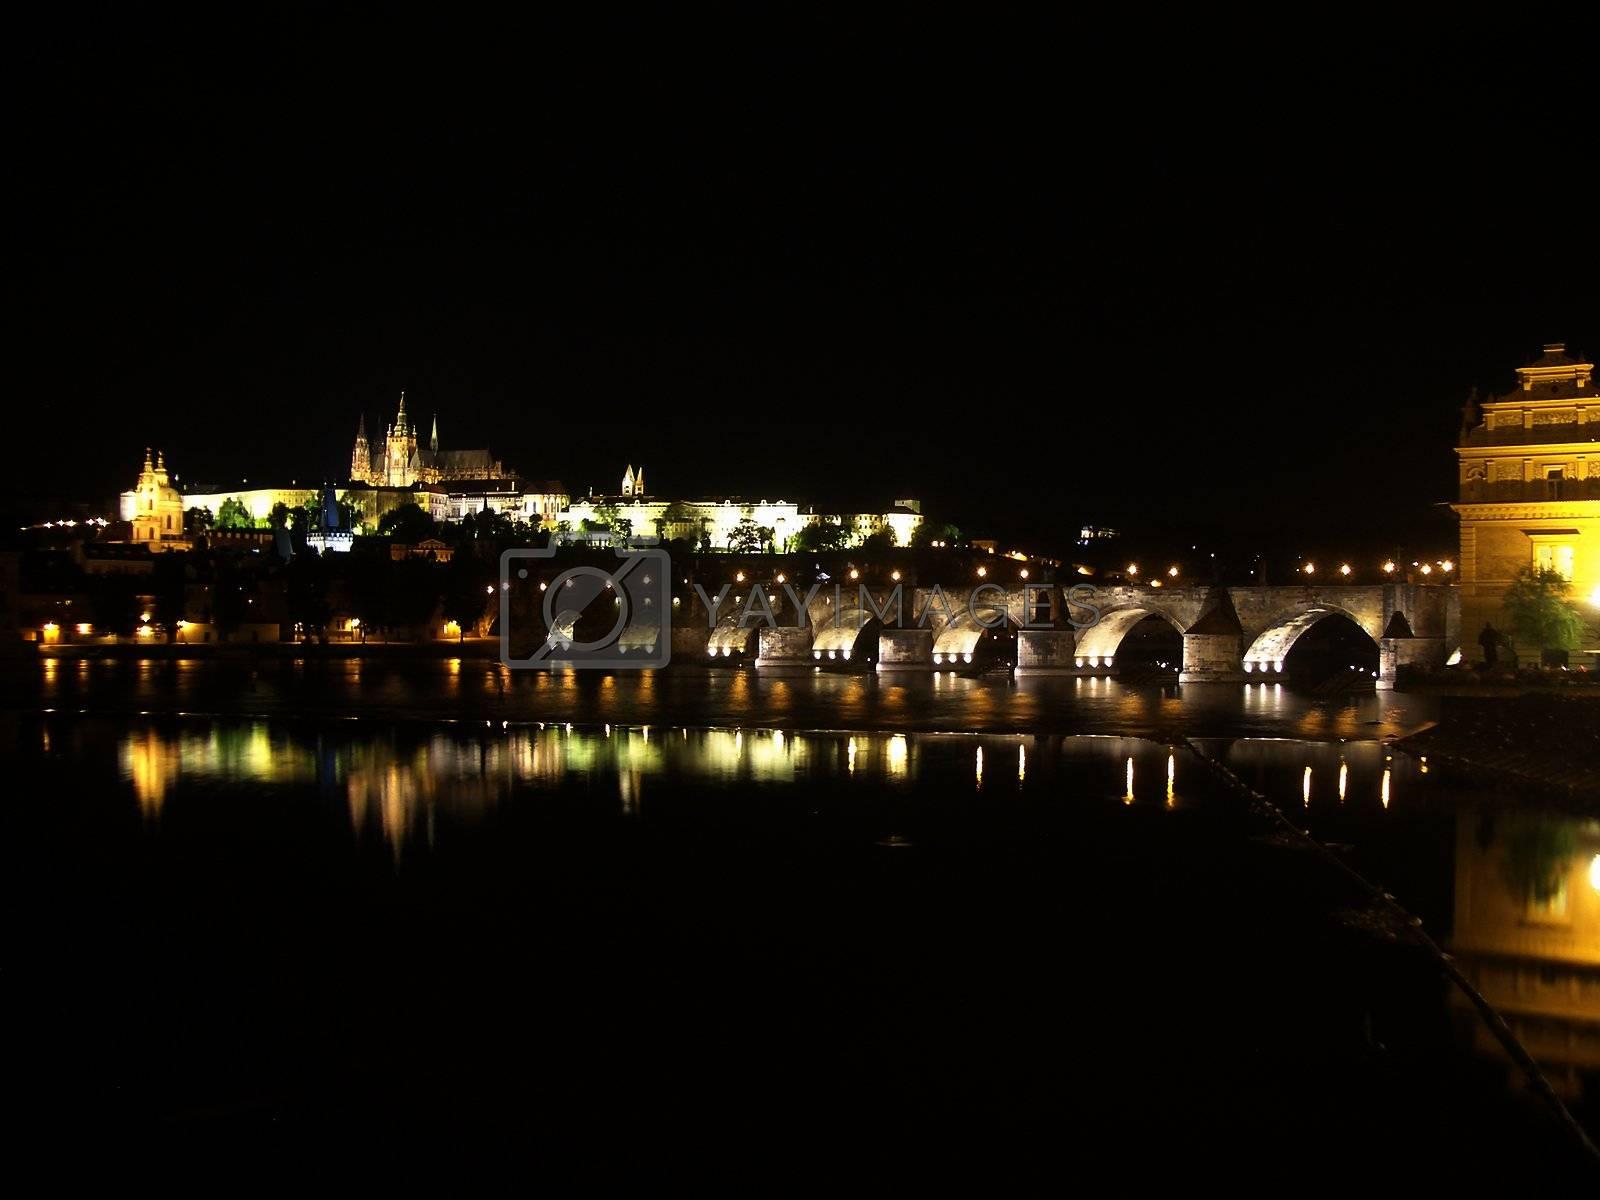 Prague Castle at Night, Czech Republic by Marco Rubino